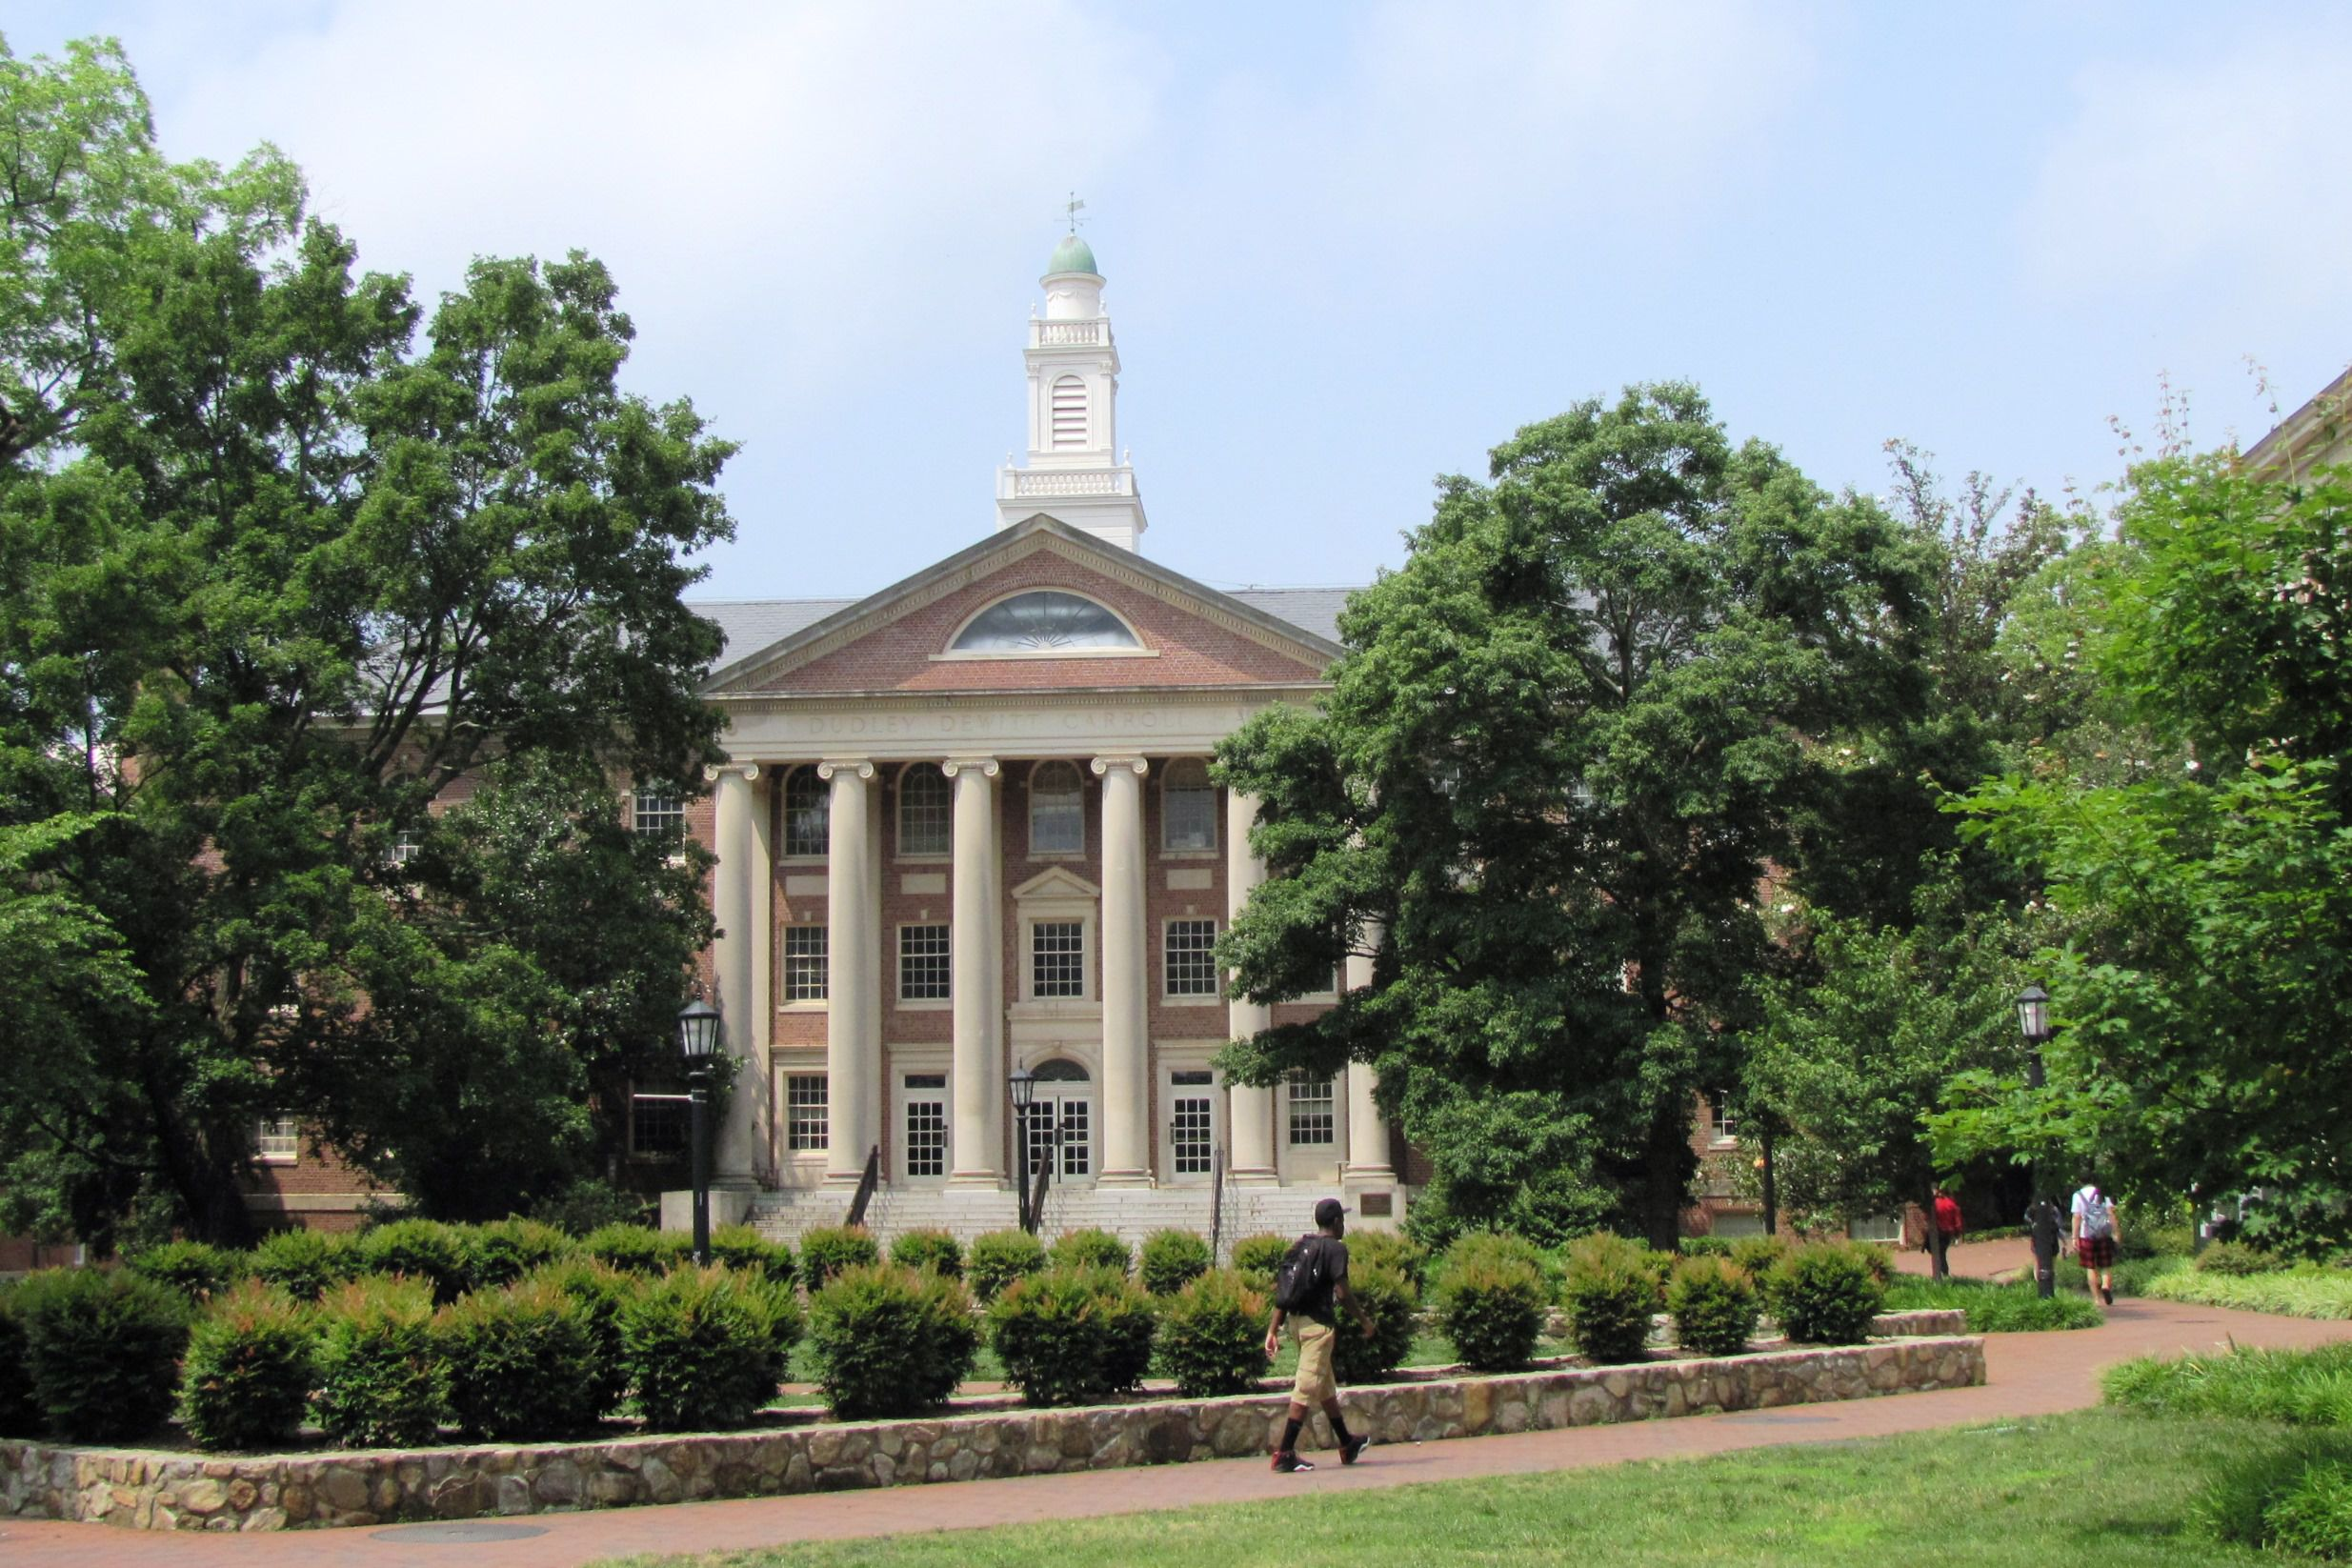 The University of North Carolina Chapel Hill